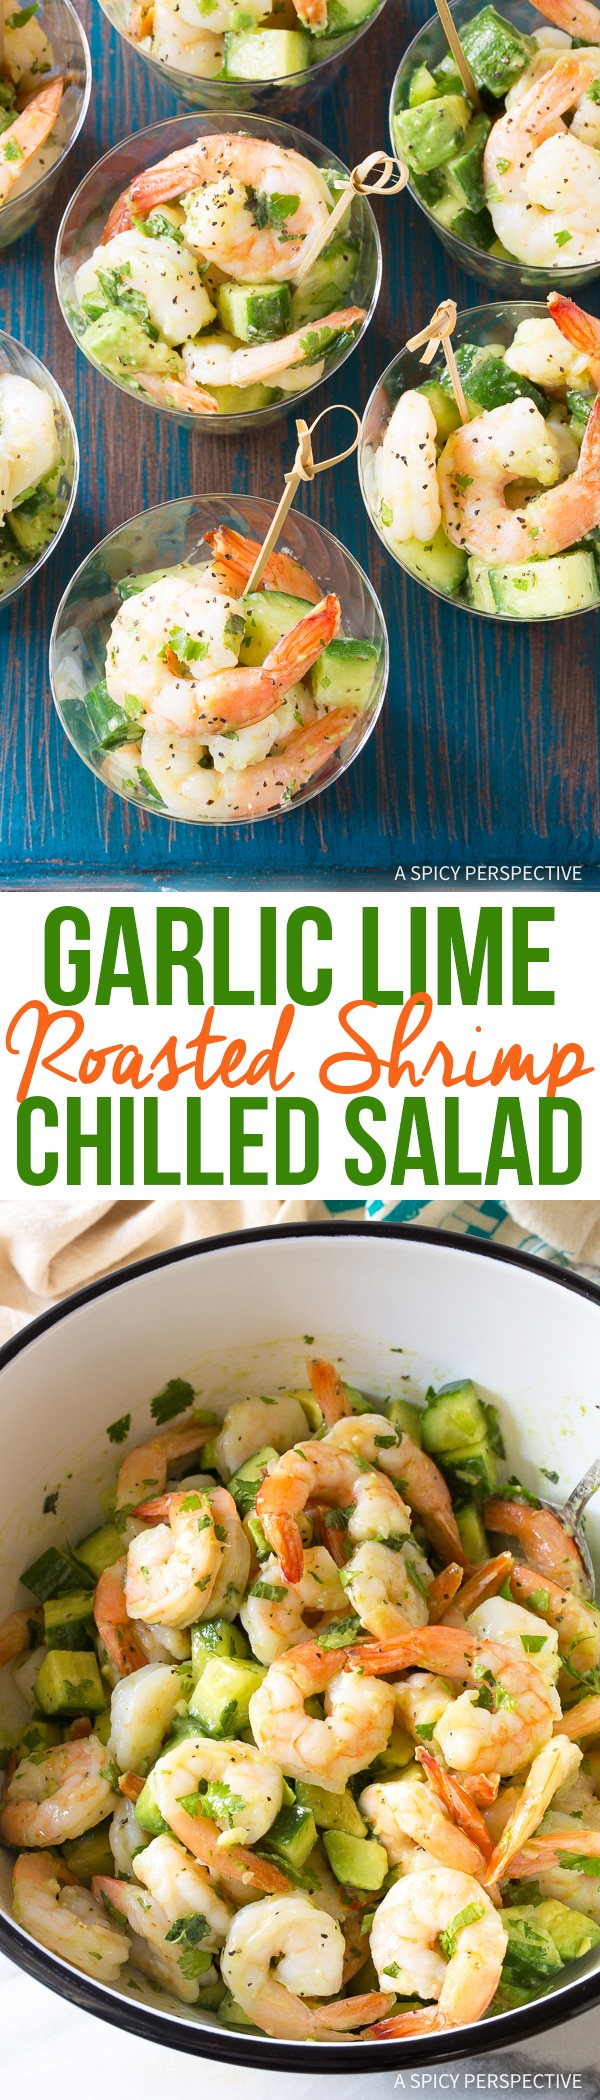 Chilled Garlic Lime Roasted Shrimp Salad Recipe for Spring and Summer!